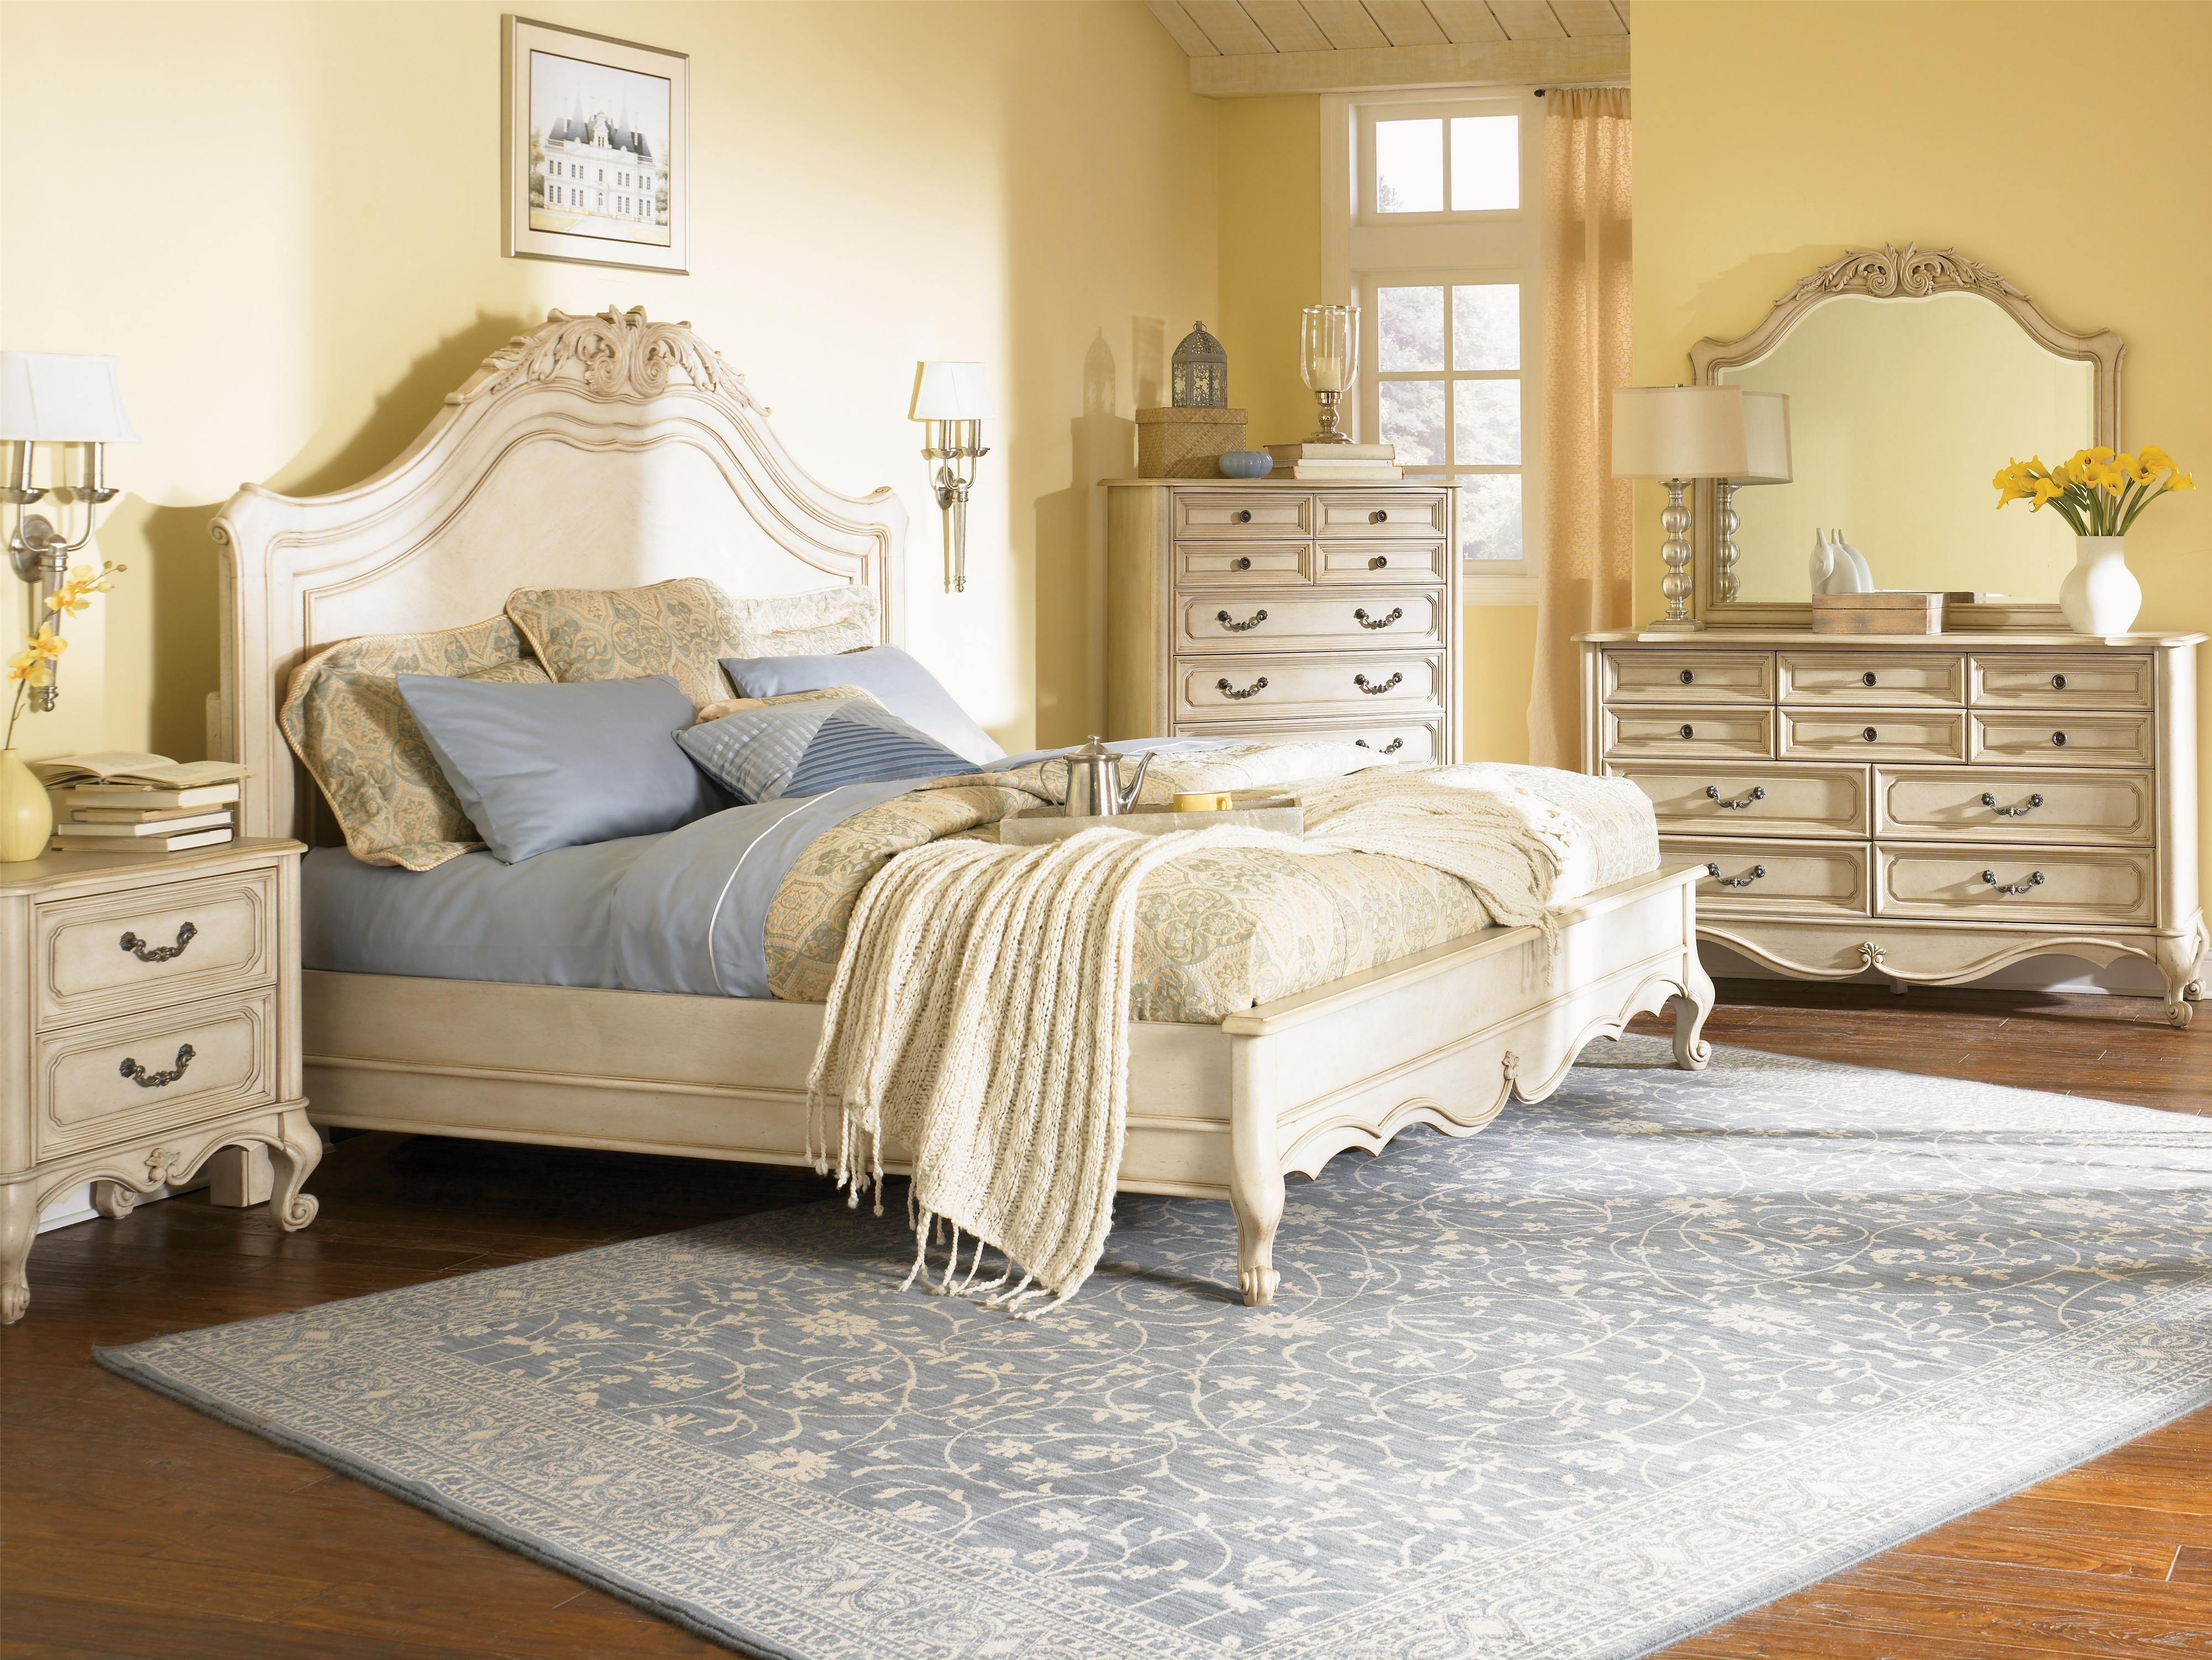 Dhi La Salle Vintage Bedroom Sets Vintage Bedroom Styles Cream Bedroom Furniture